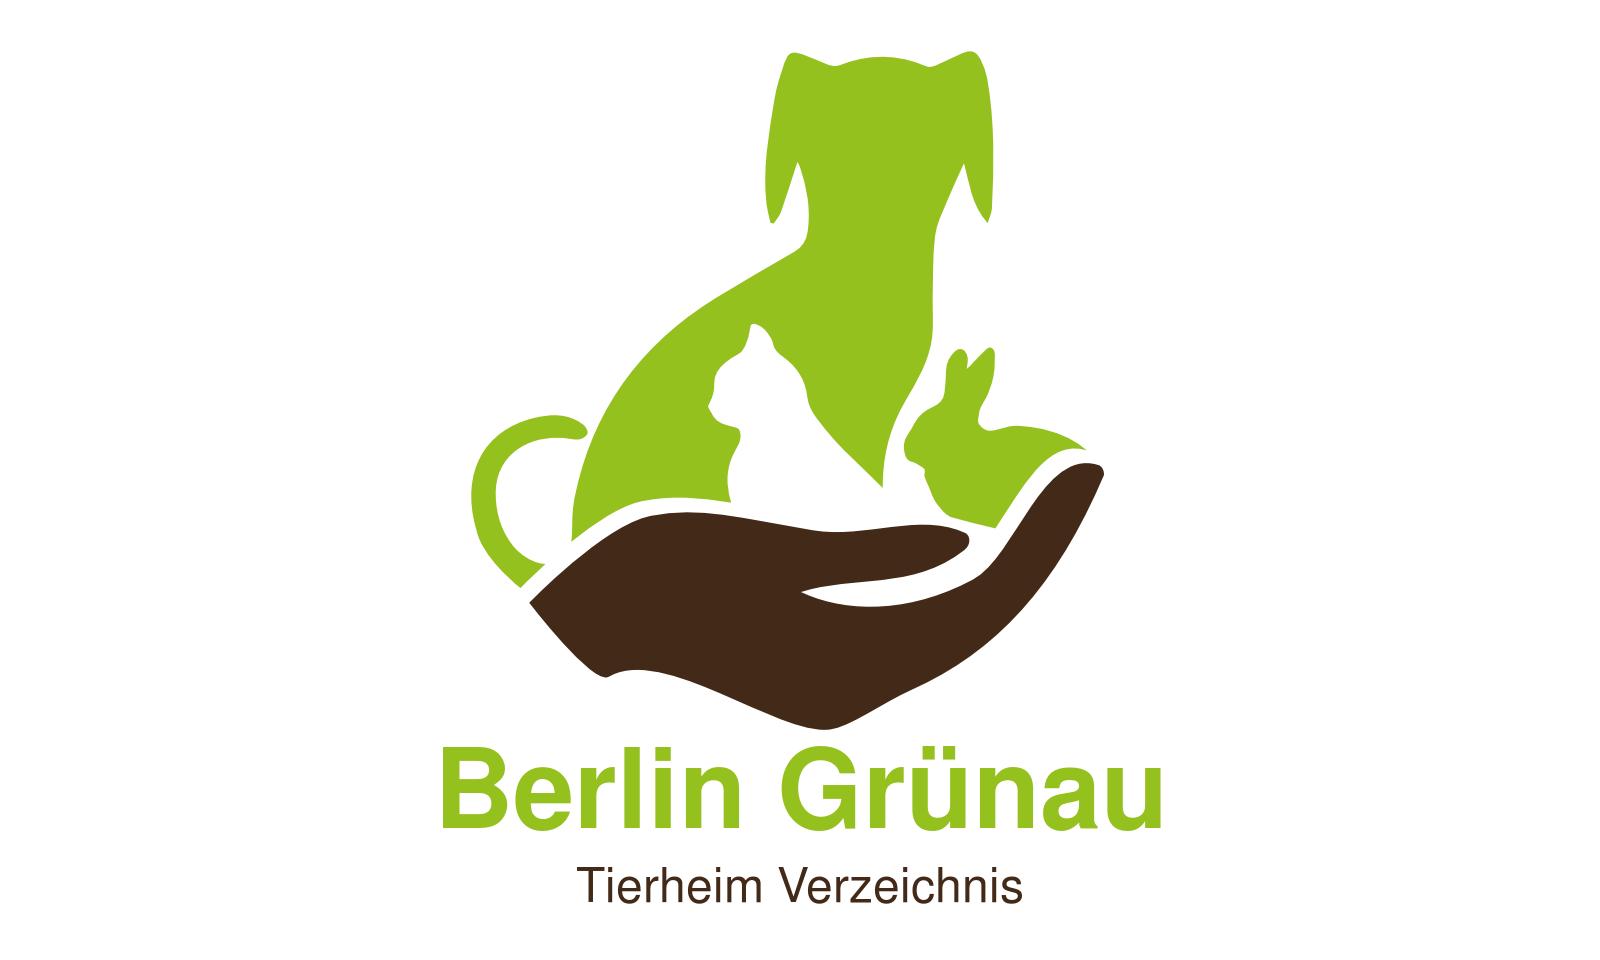 Tierheim Berlin Grünau